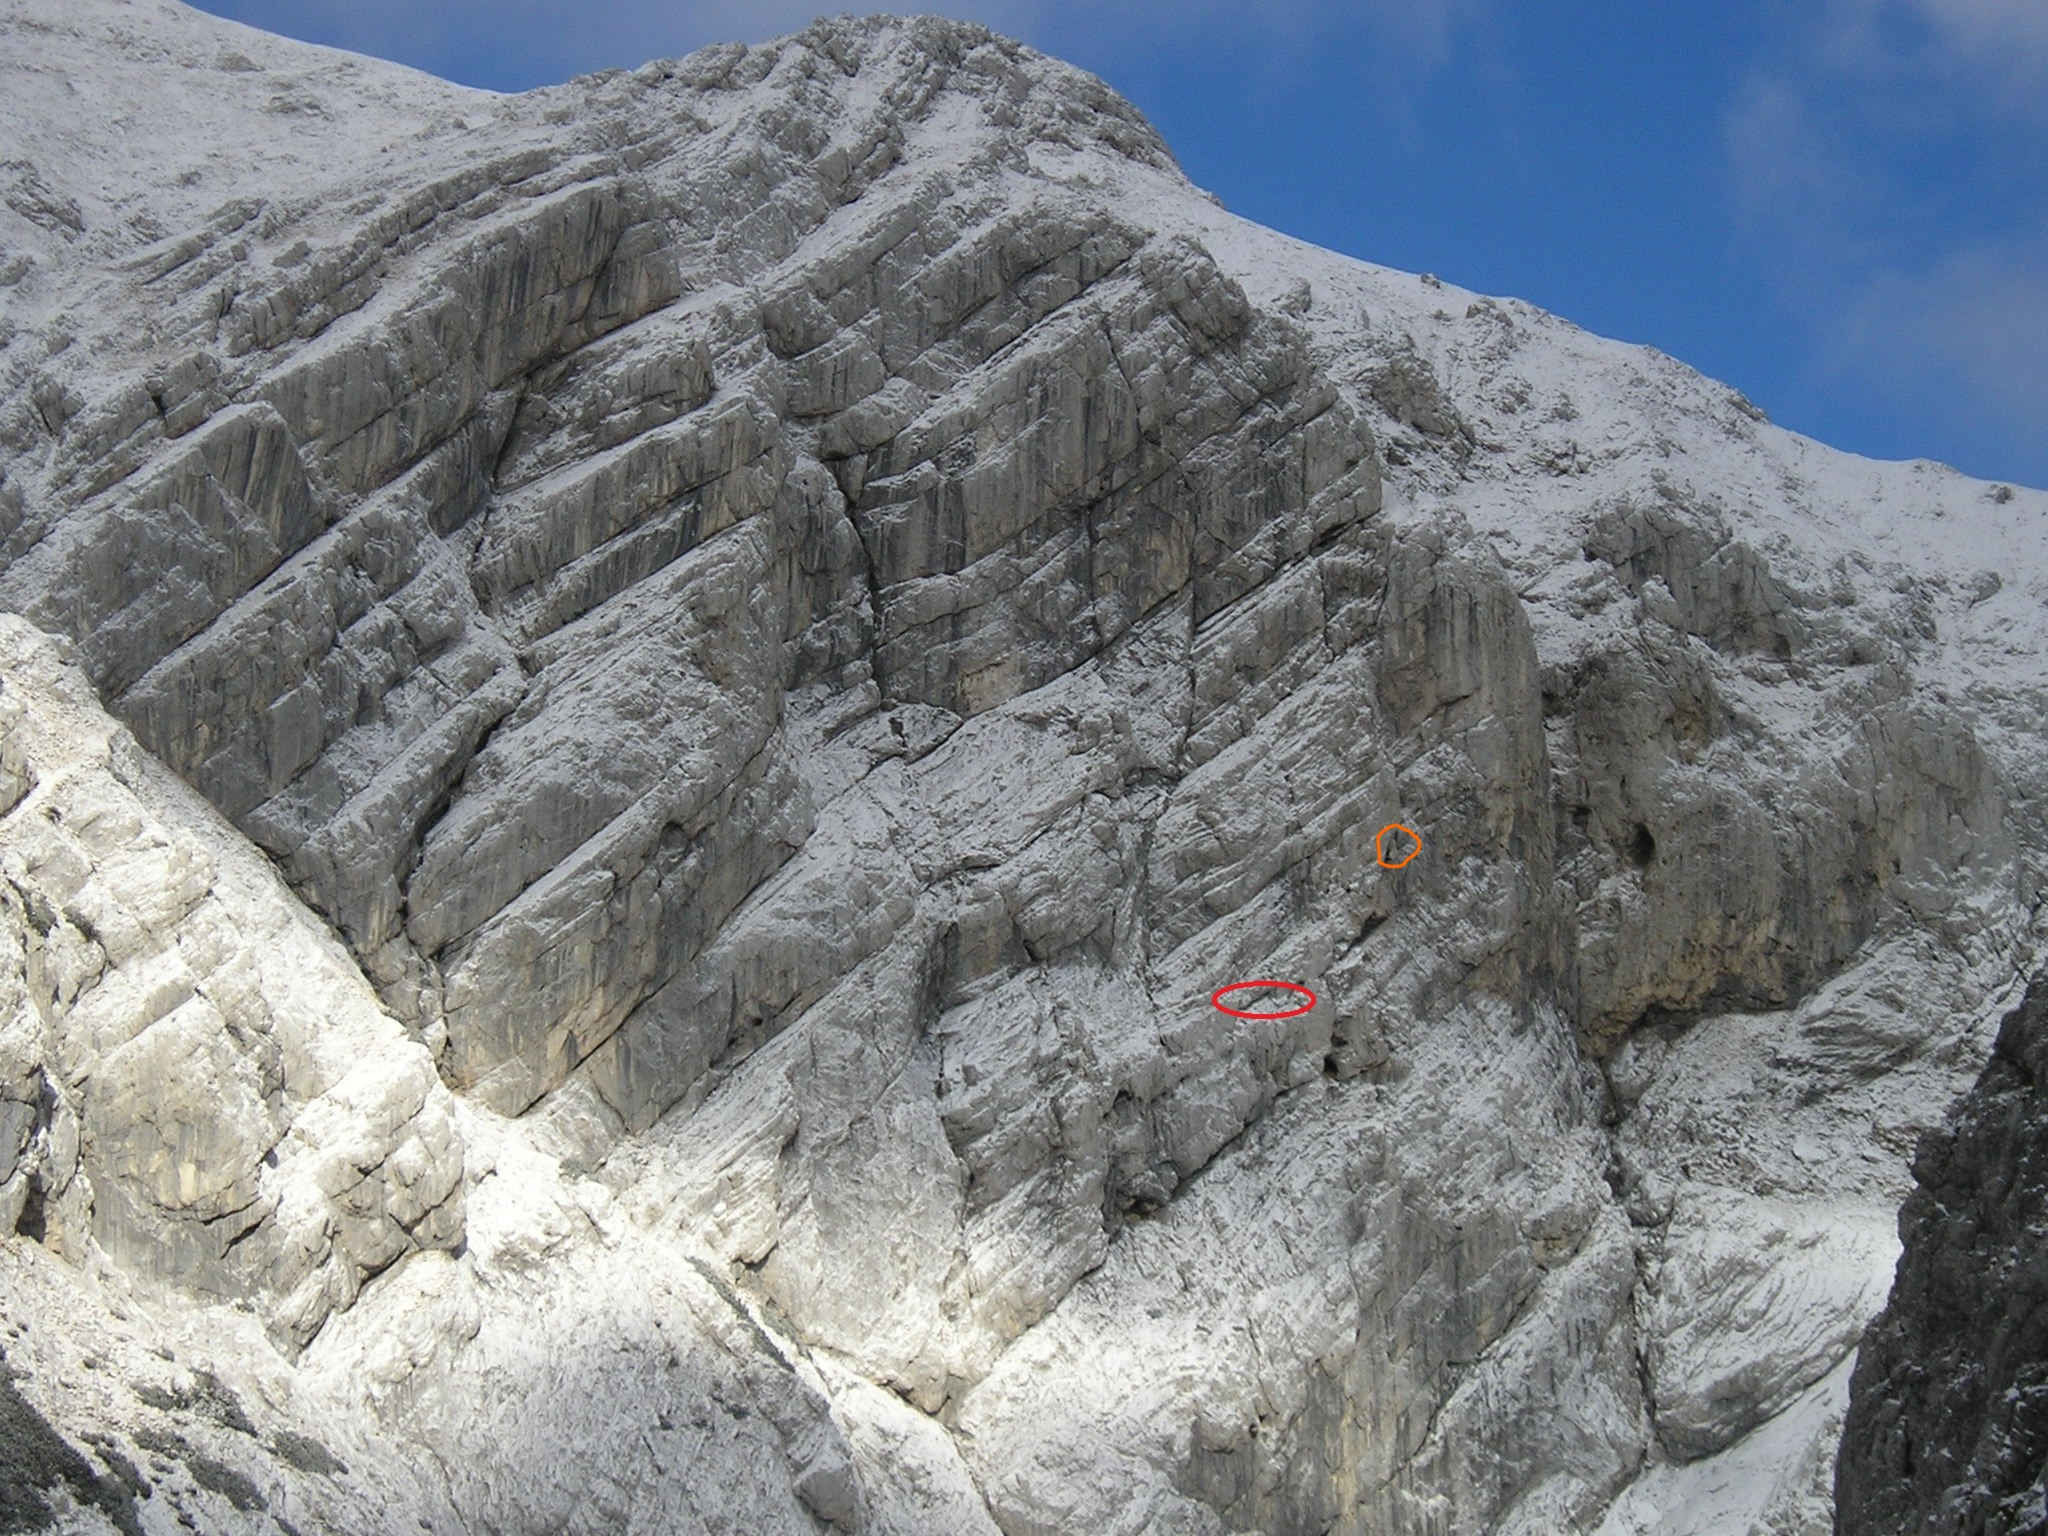 20130706-grs-intervencija-zaplezana_alpinista-jv_stena_planjave_04